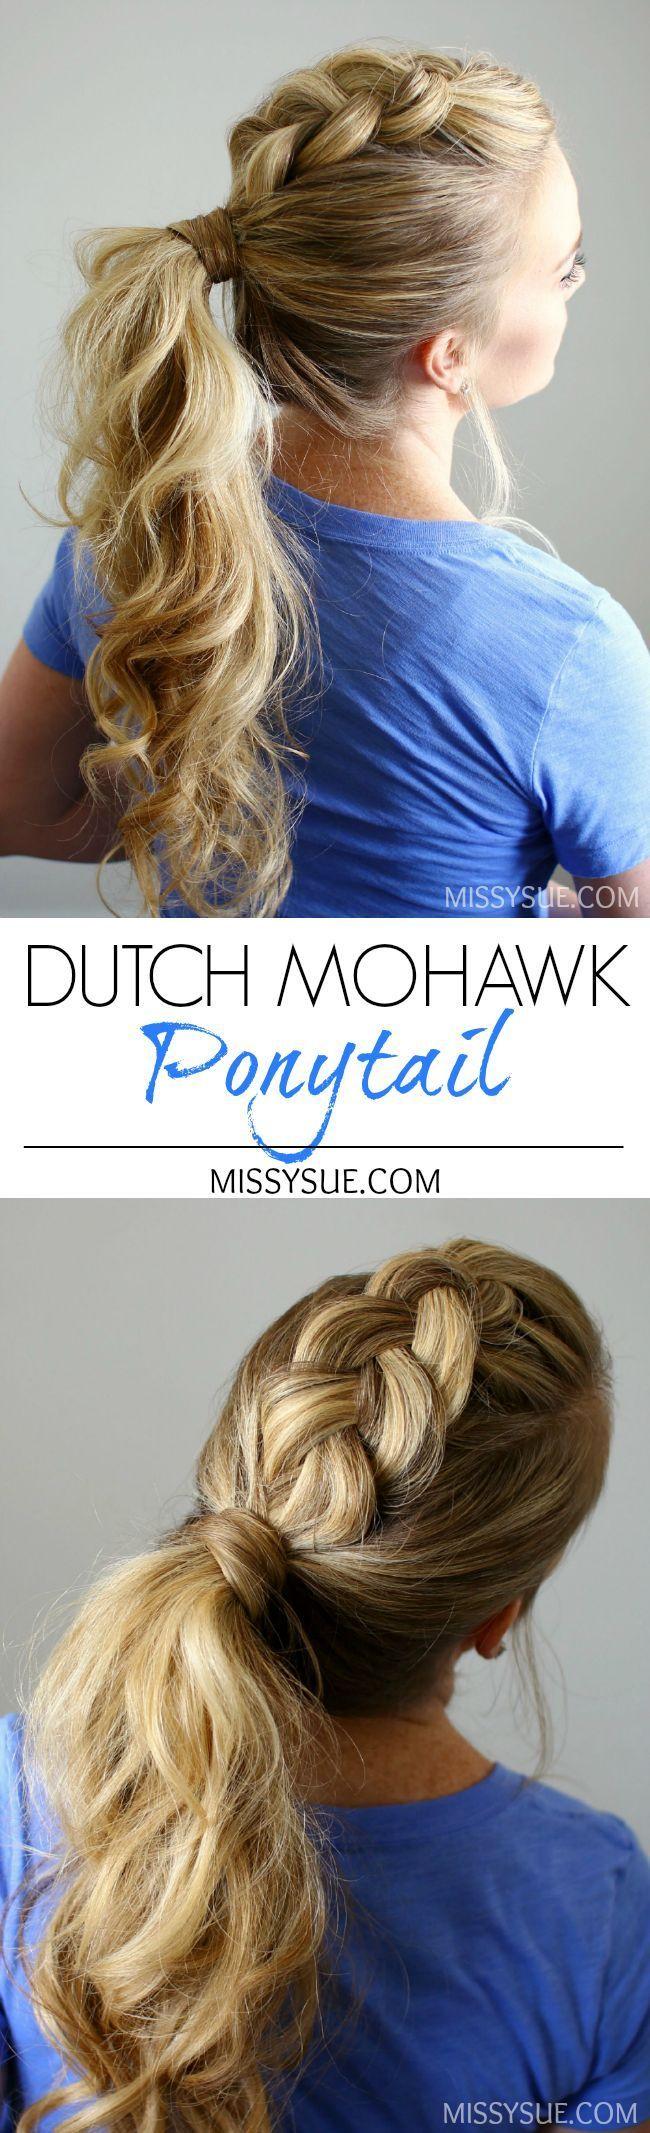 best 25+ mohawk ponytail ideas on pinterest | mohawk with braids